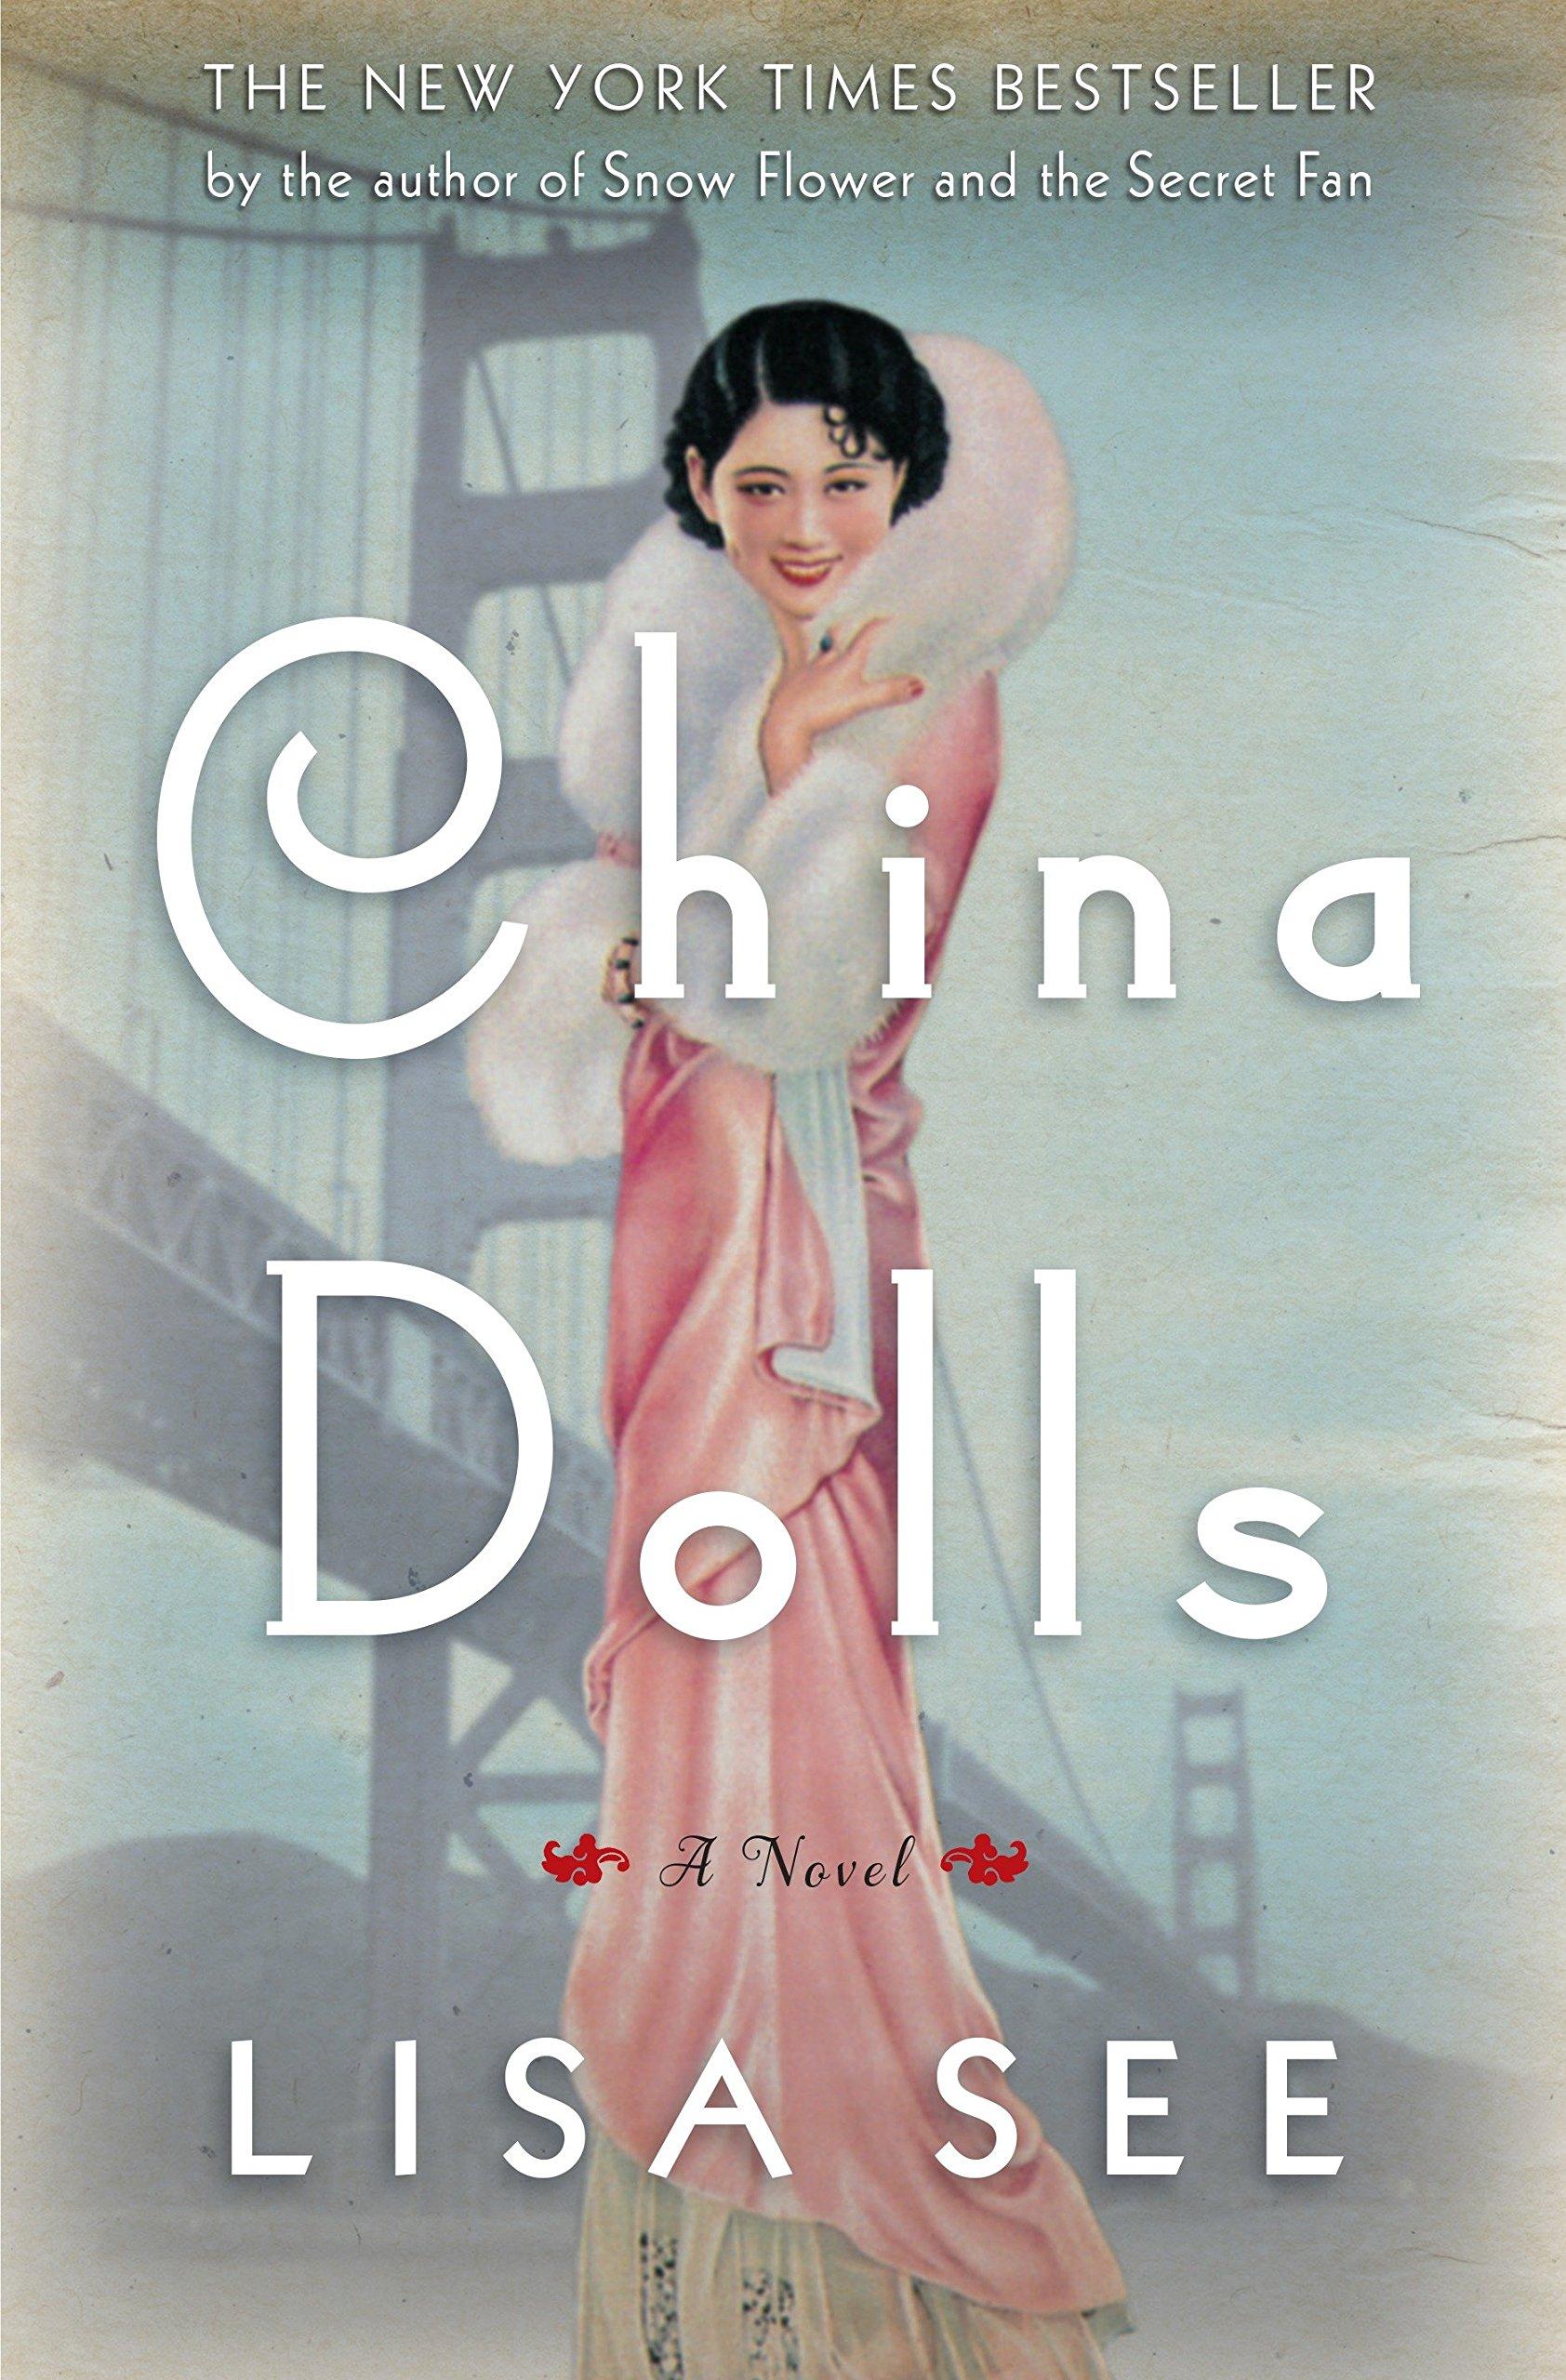 e741f682a China Dolls: A Novel: Lisa See: 9780812992892: Amazon.com: Books